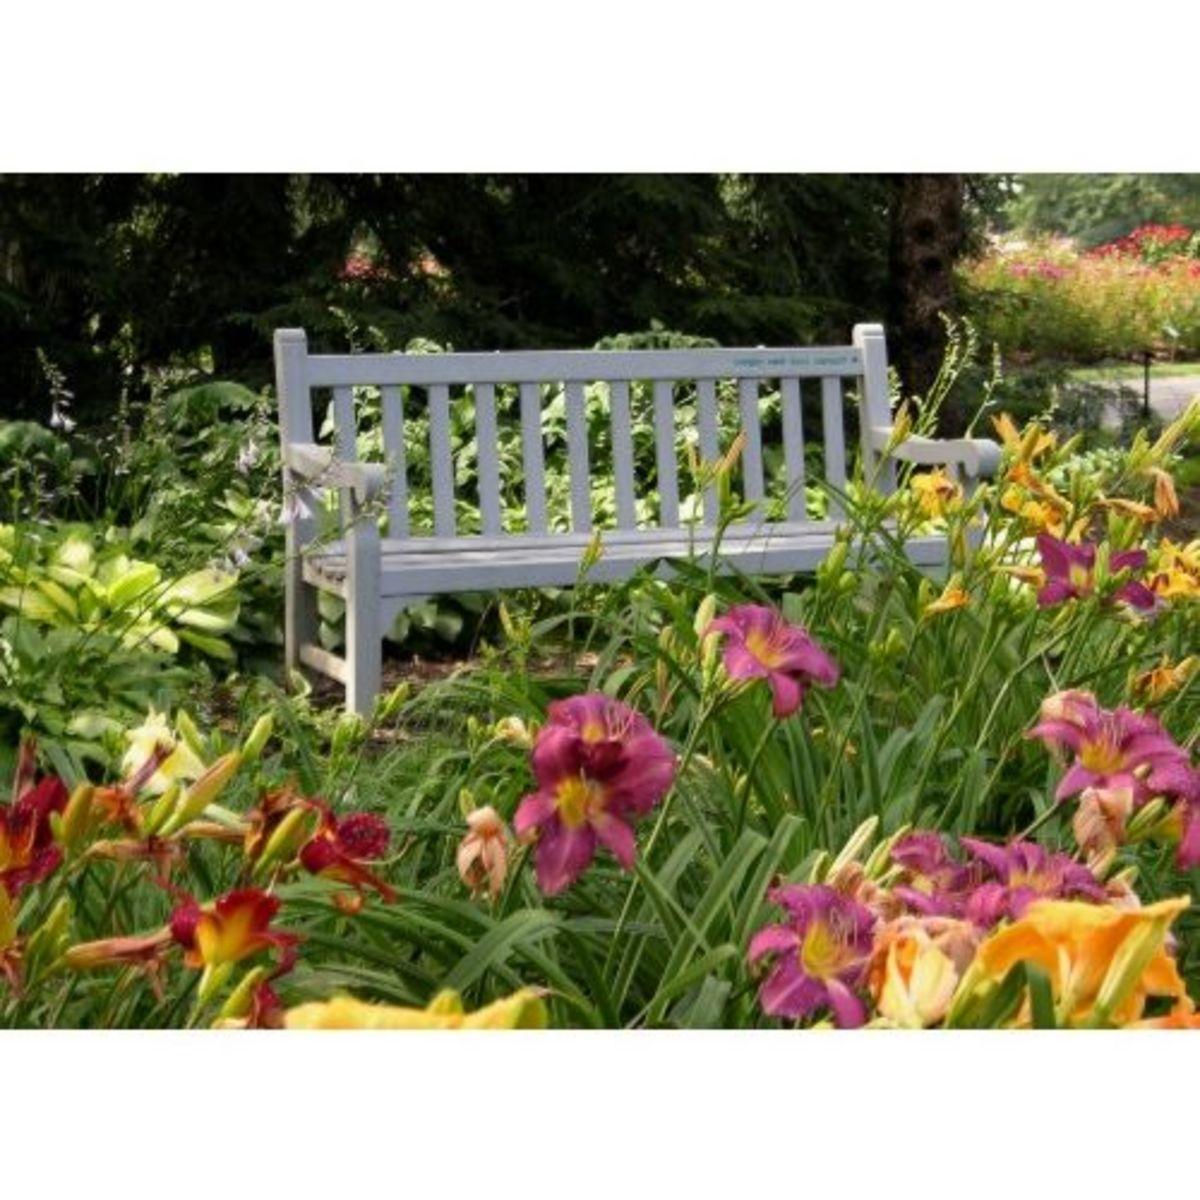 Daylilies in Whetstone Park in late June/early July